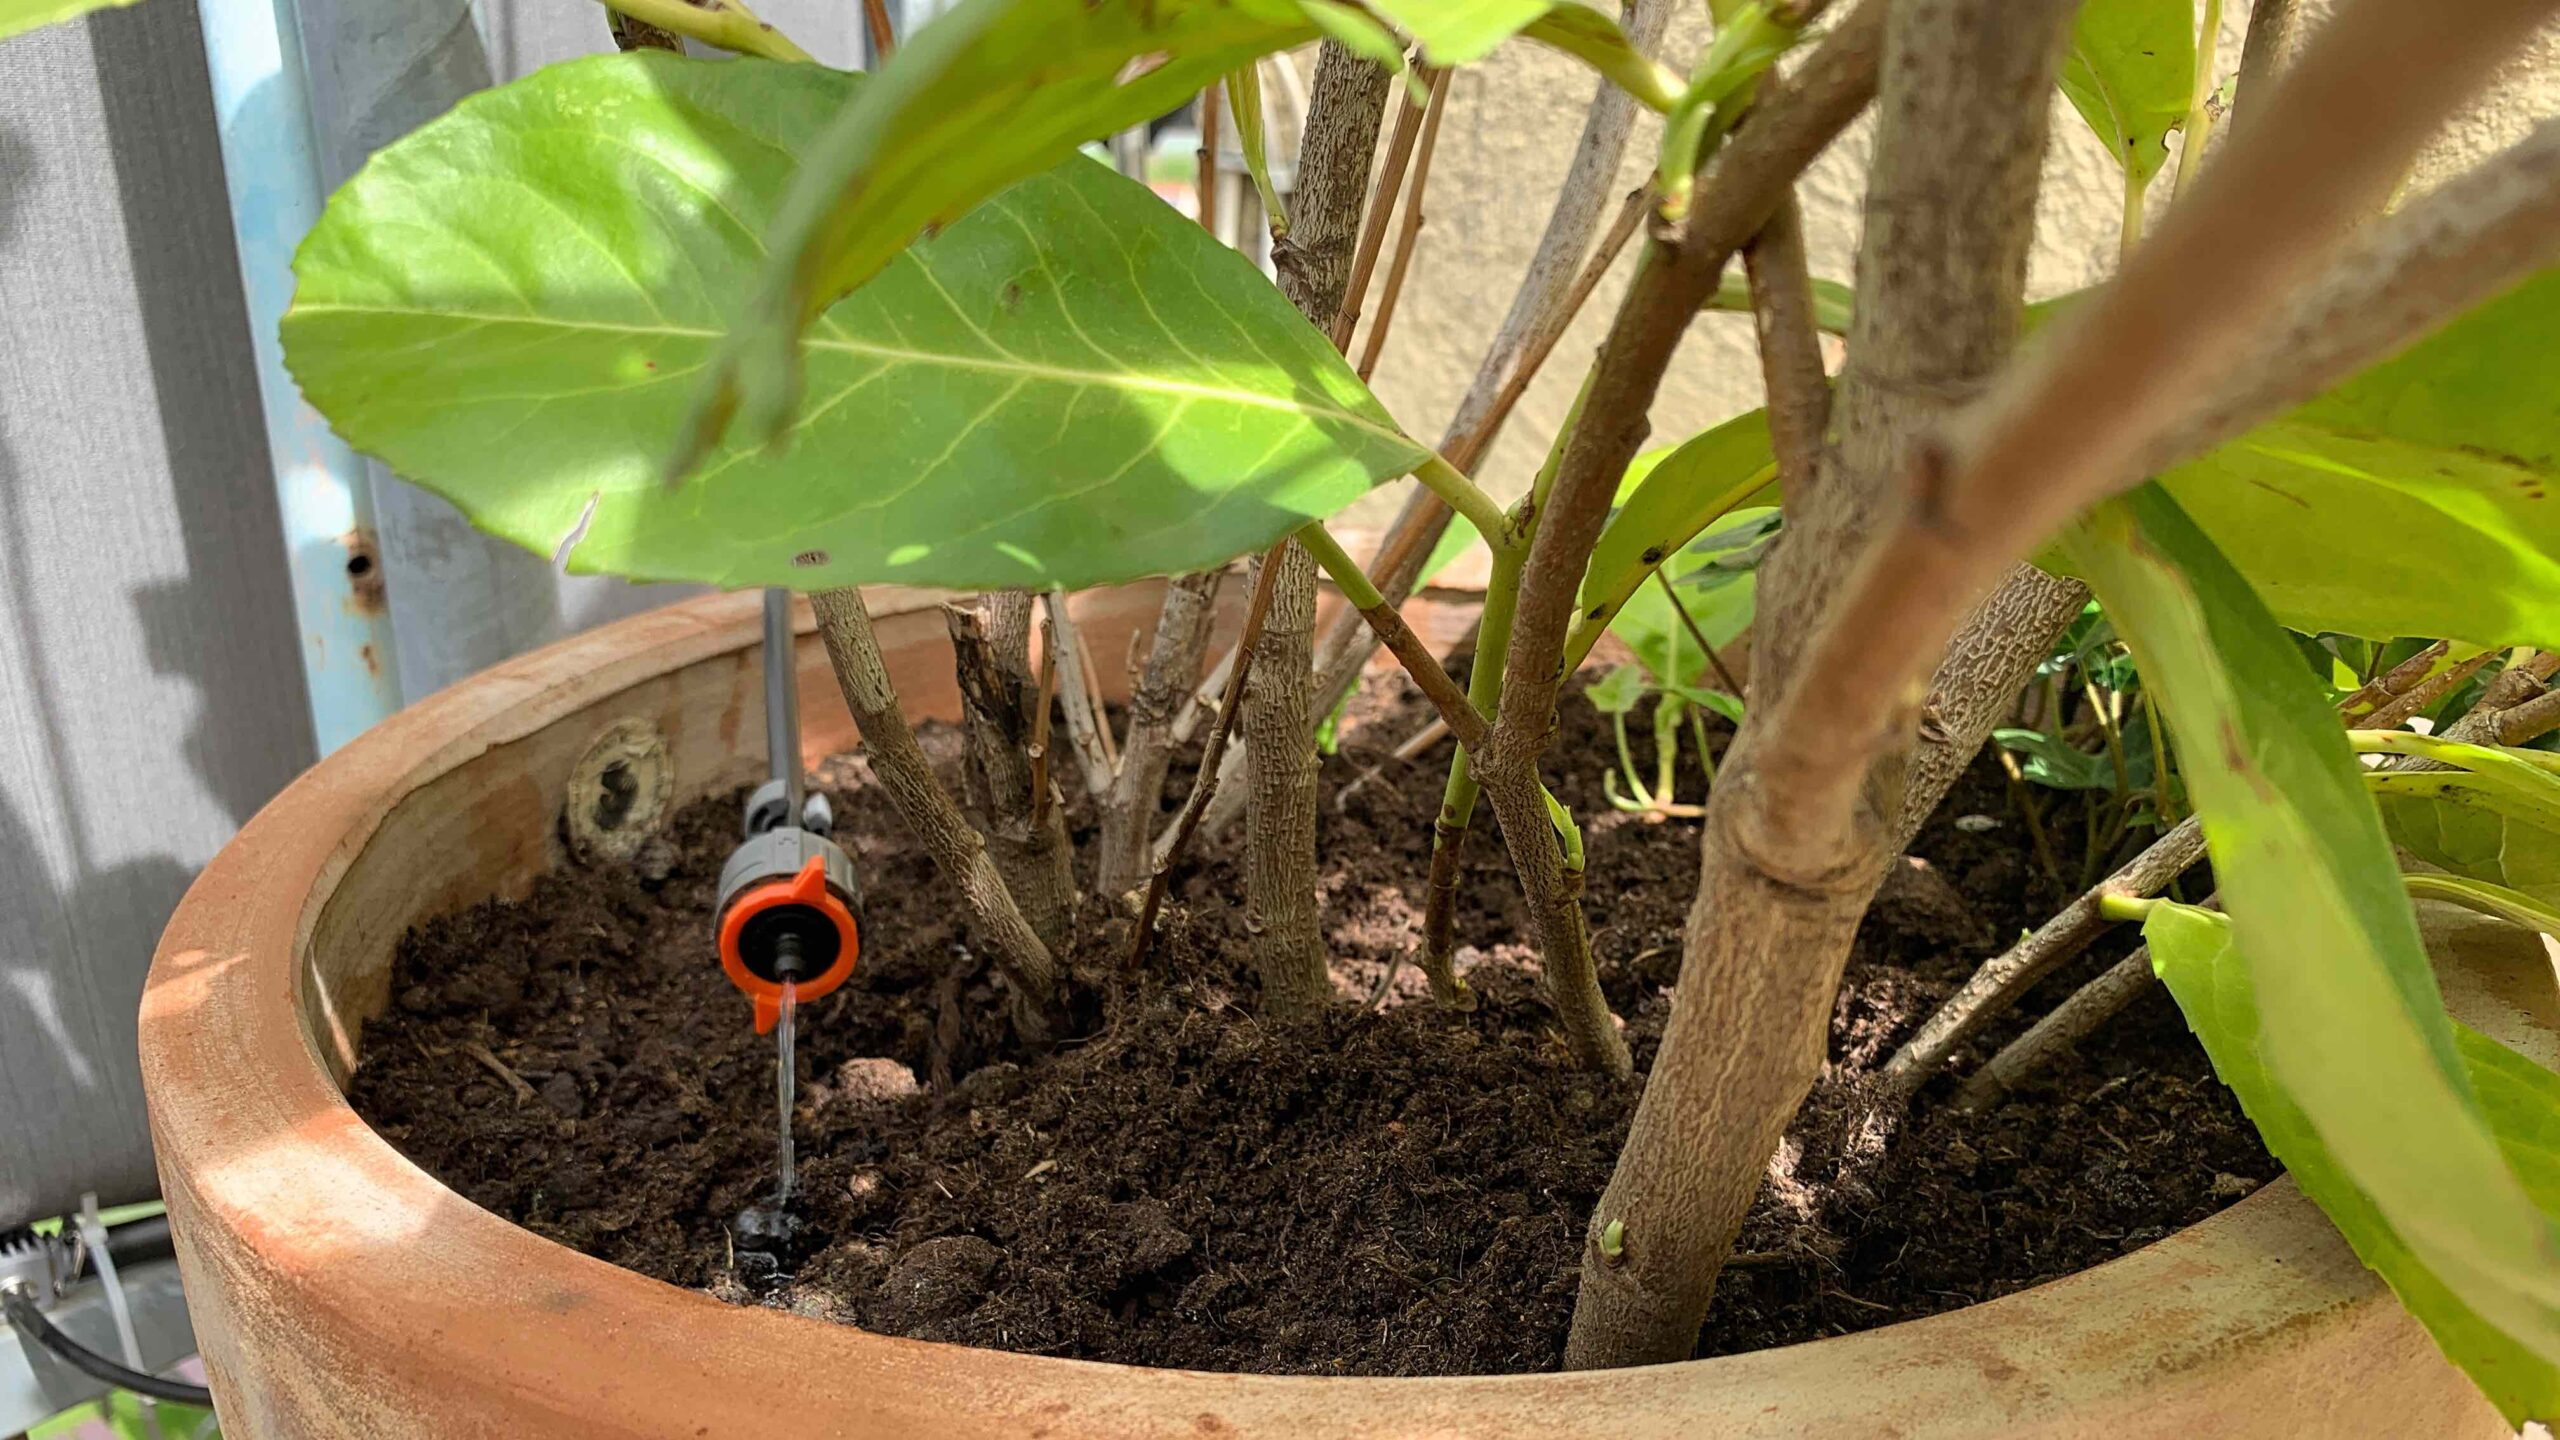 Full Size of Bewässerung Balkon Pflanzen Auf Terrasse Automatisiert Mit Apple Homekit Bewssern Garten Bewässerungssystem Bewässerungssysteme Automatisch Test Wohnzimmer Bewässerung Balkon